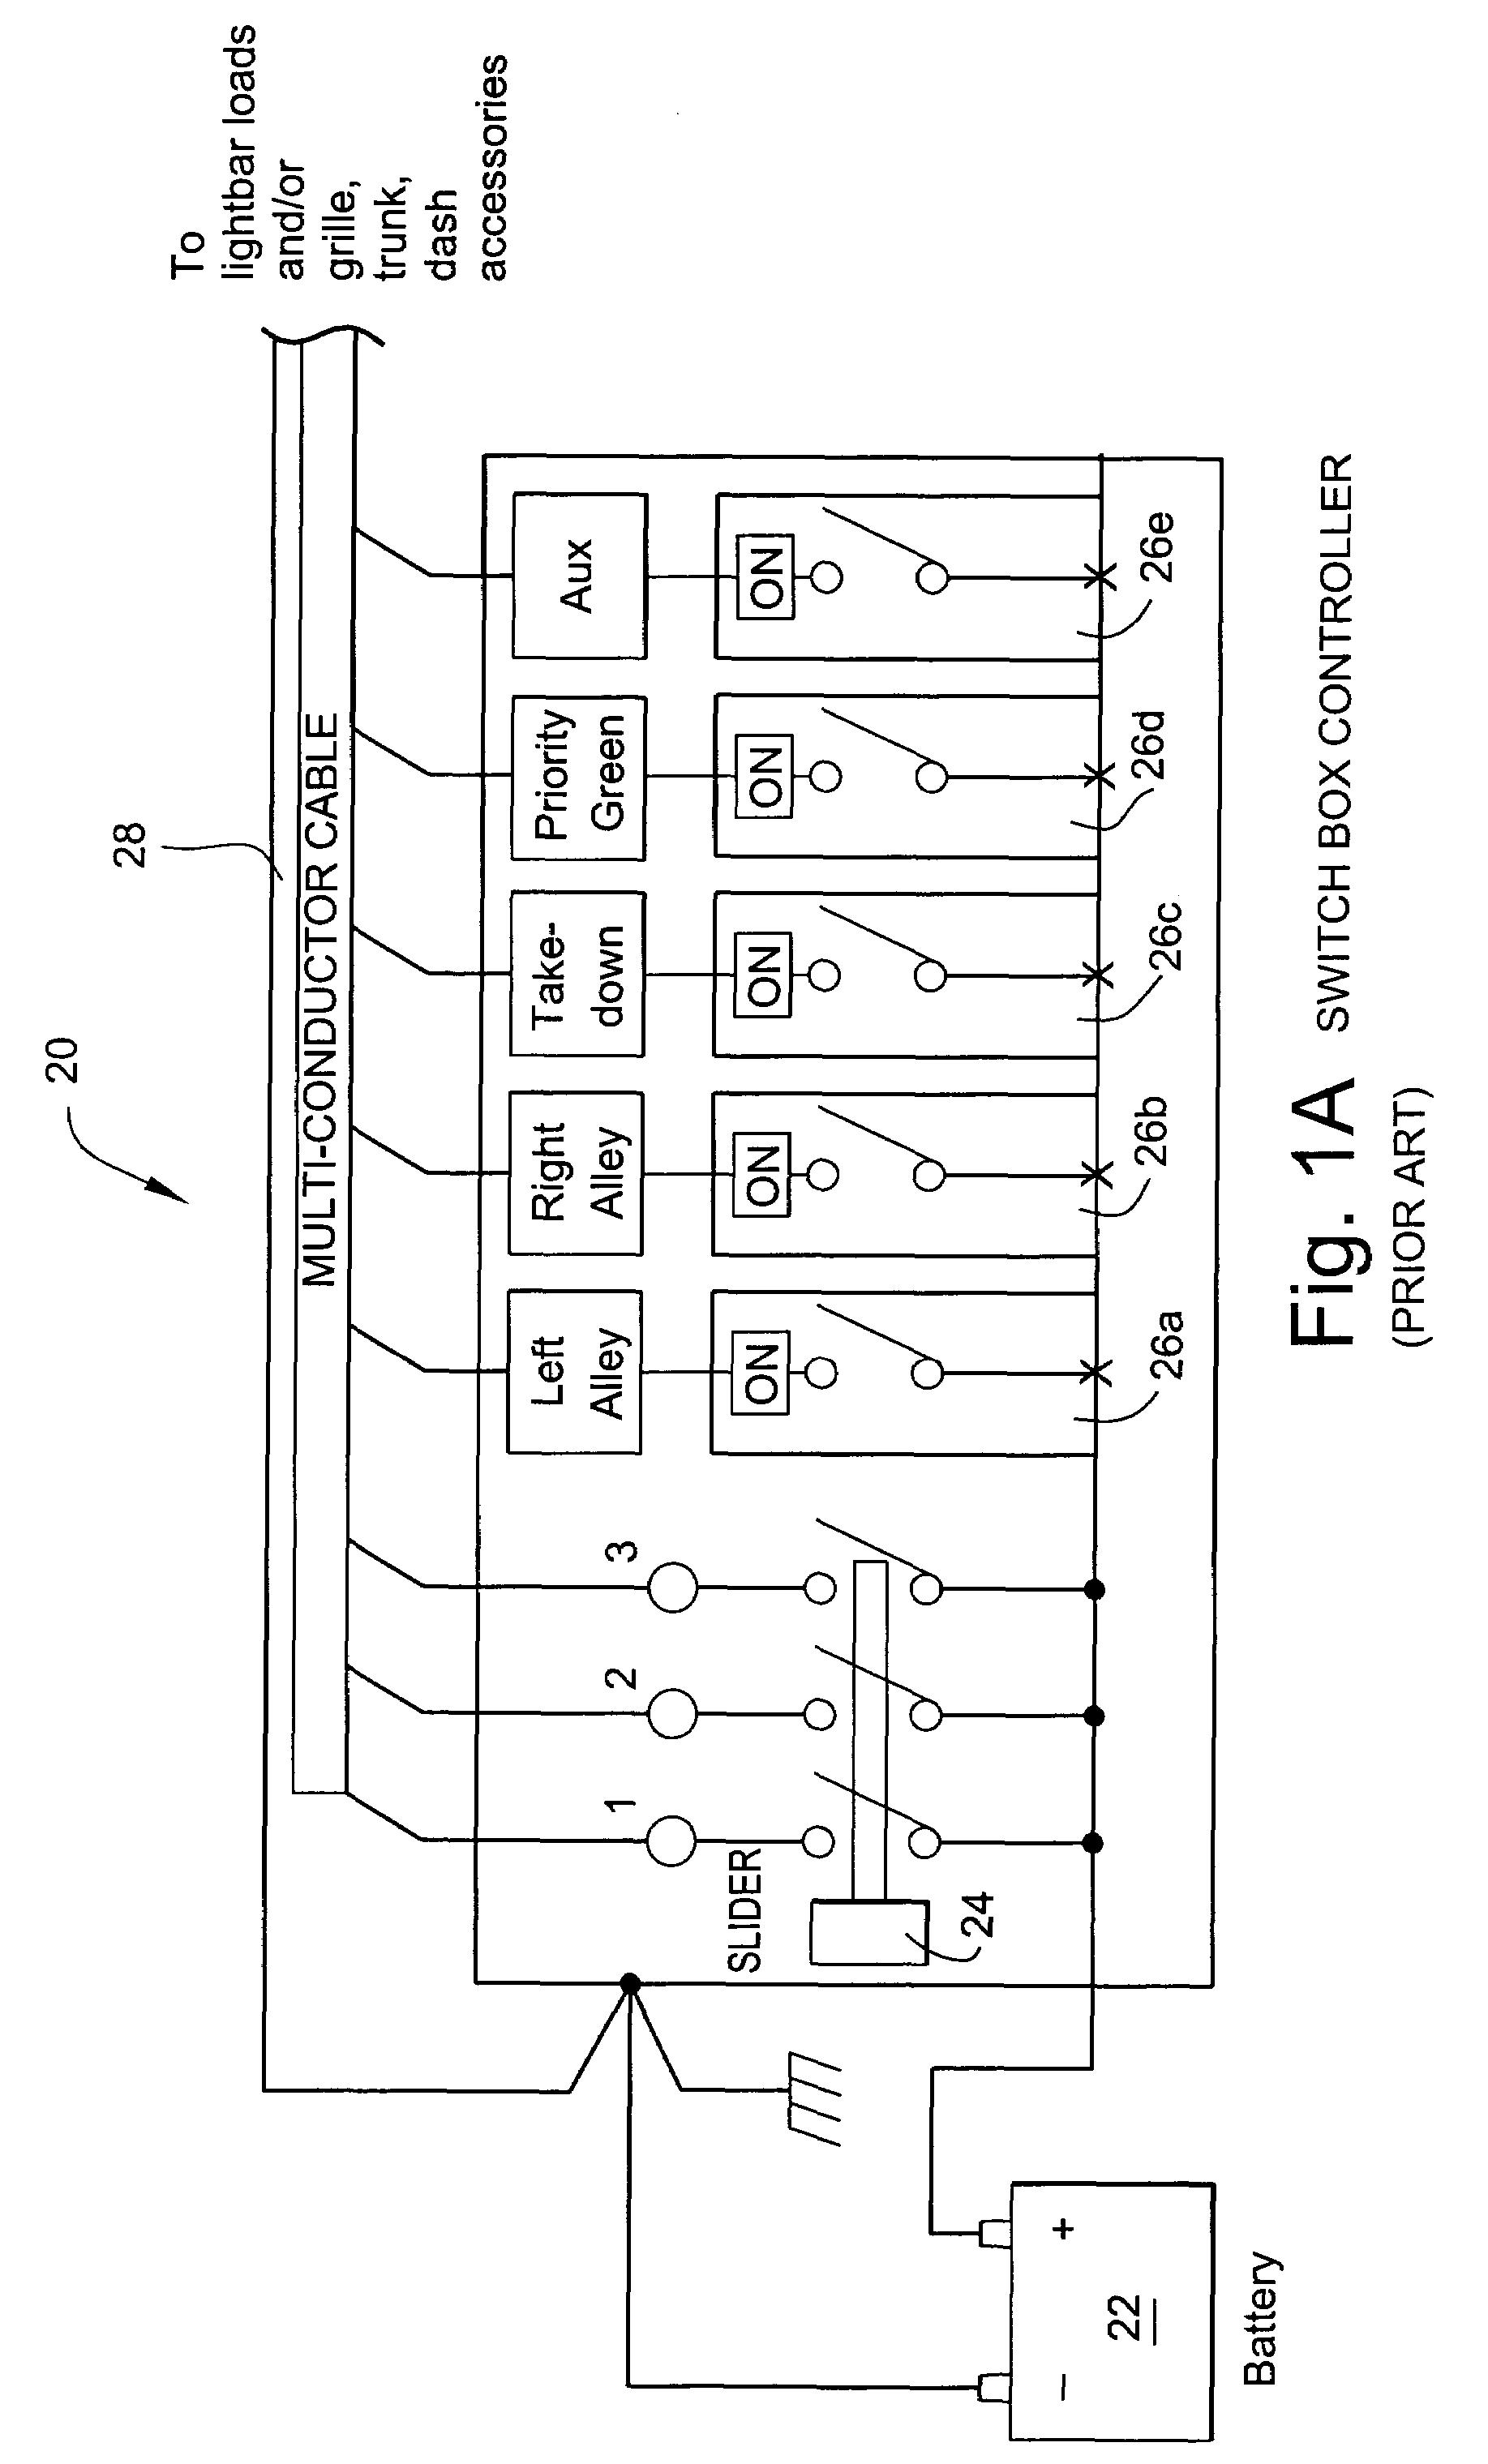 Code 3 Defender Lightbar Wiring Diagram